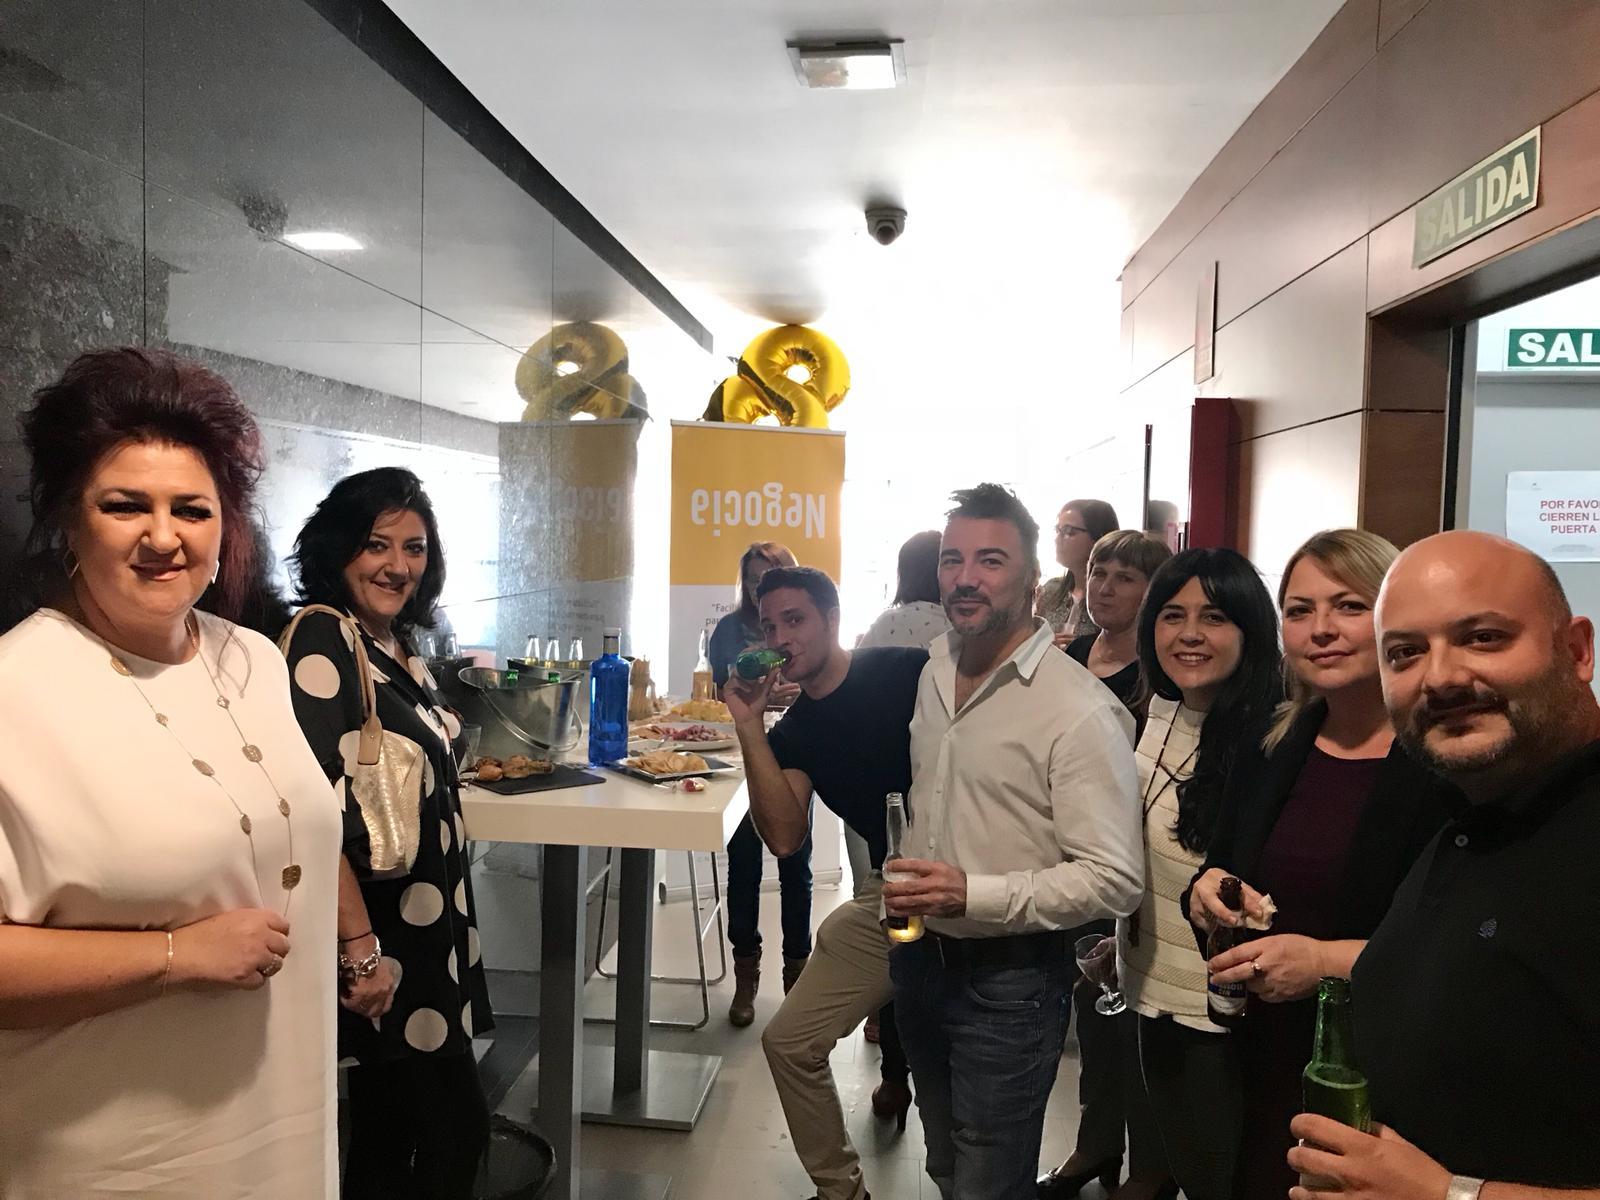 Izq. a der. Mª Carmen, Dolly, Carlos, Samuel, Natalia, May y Pepe